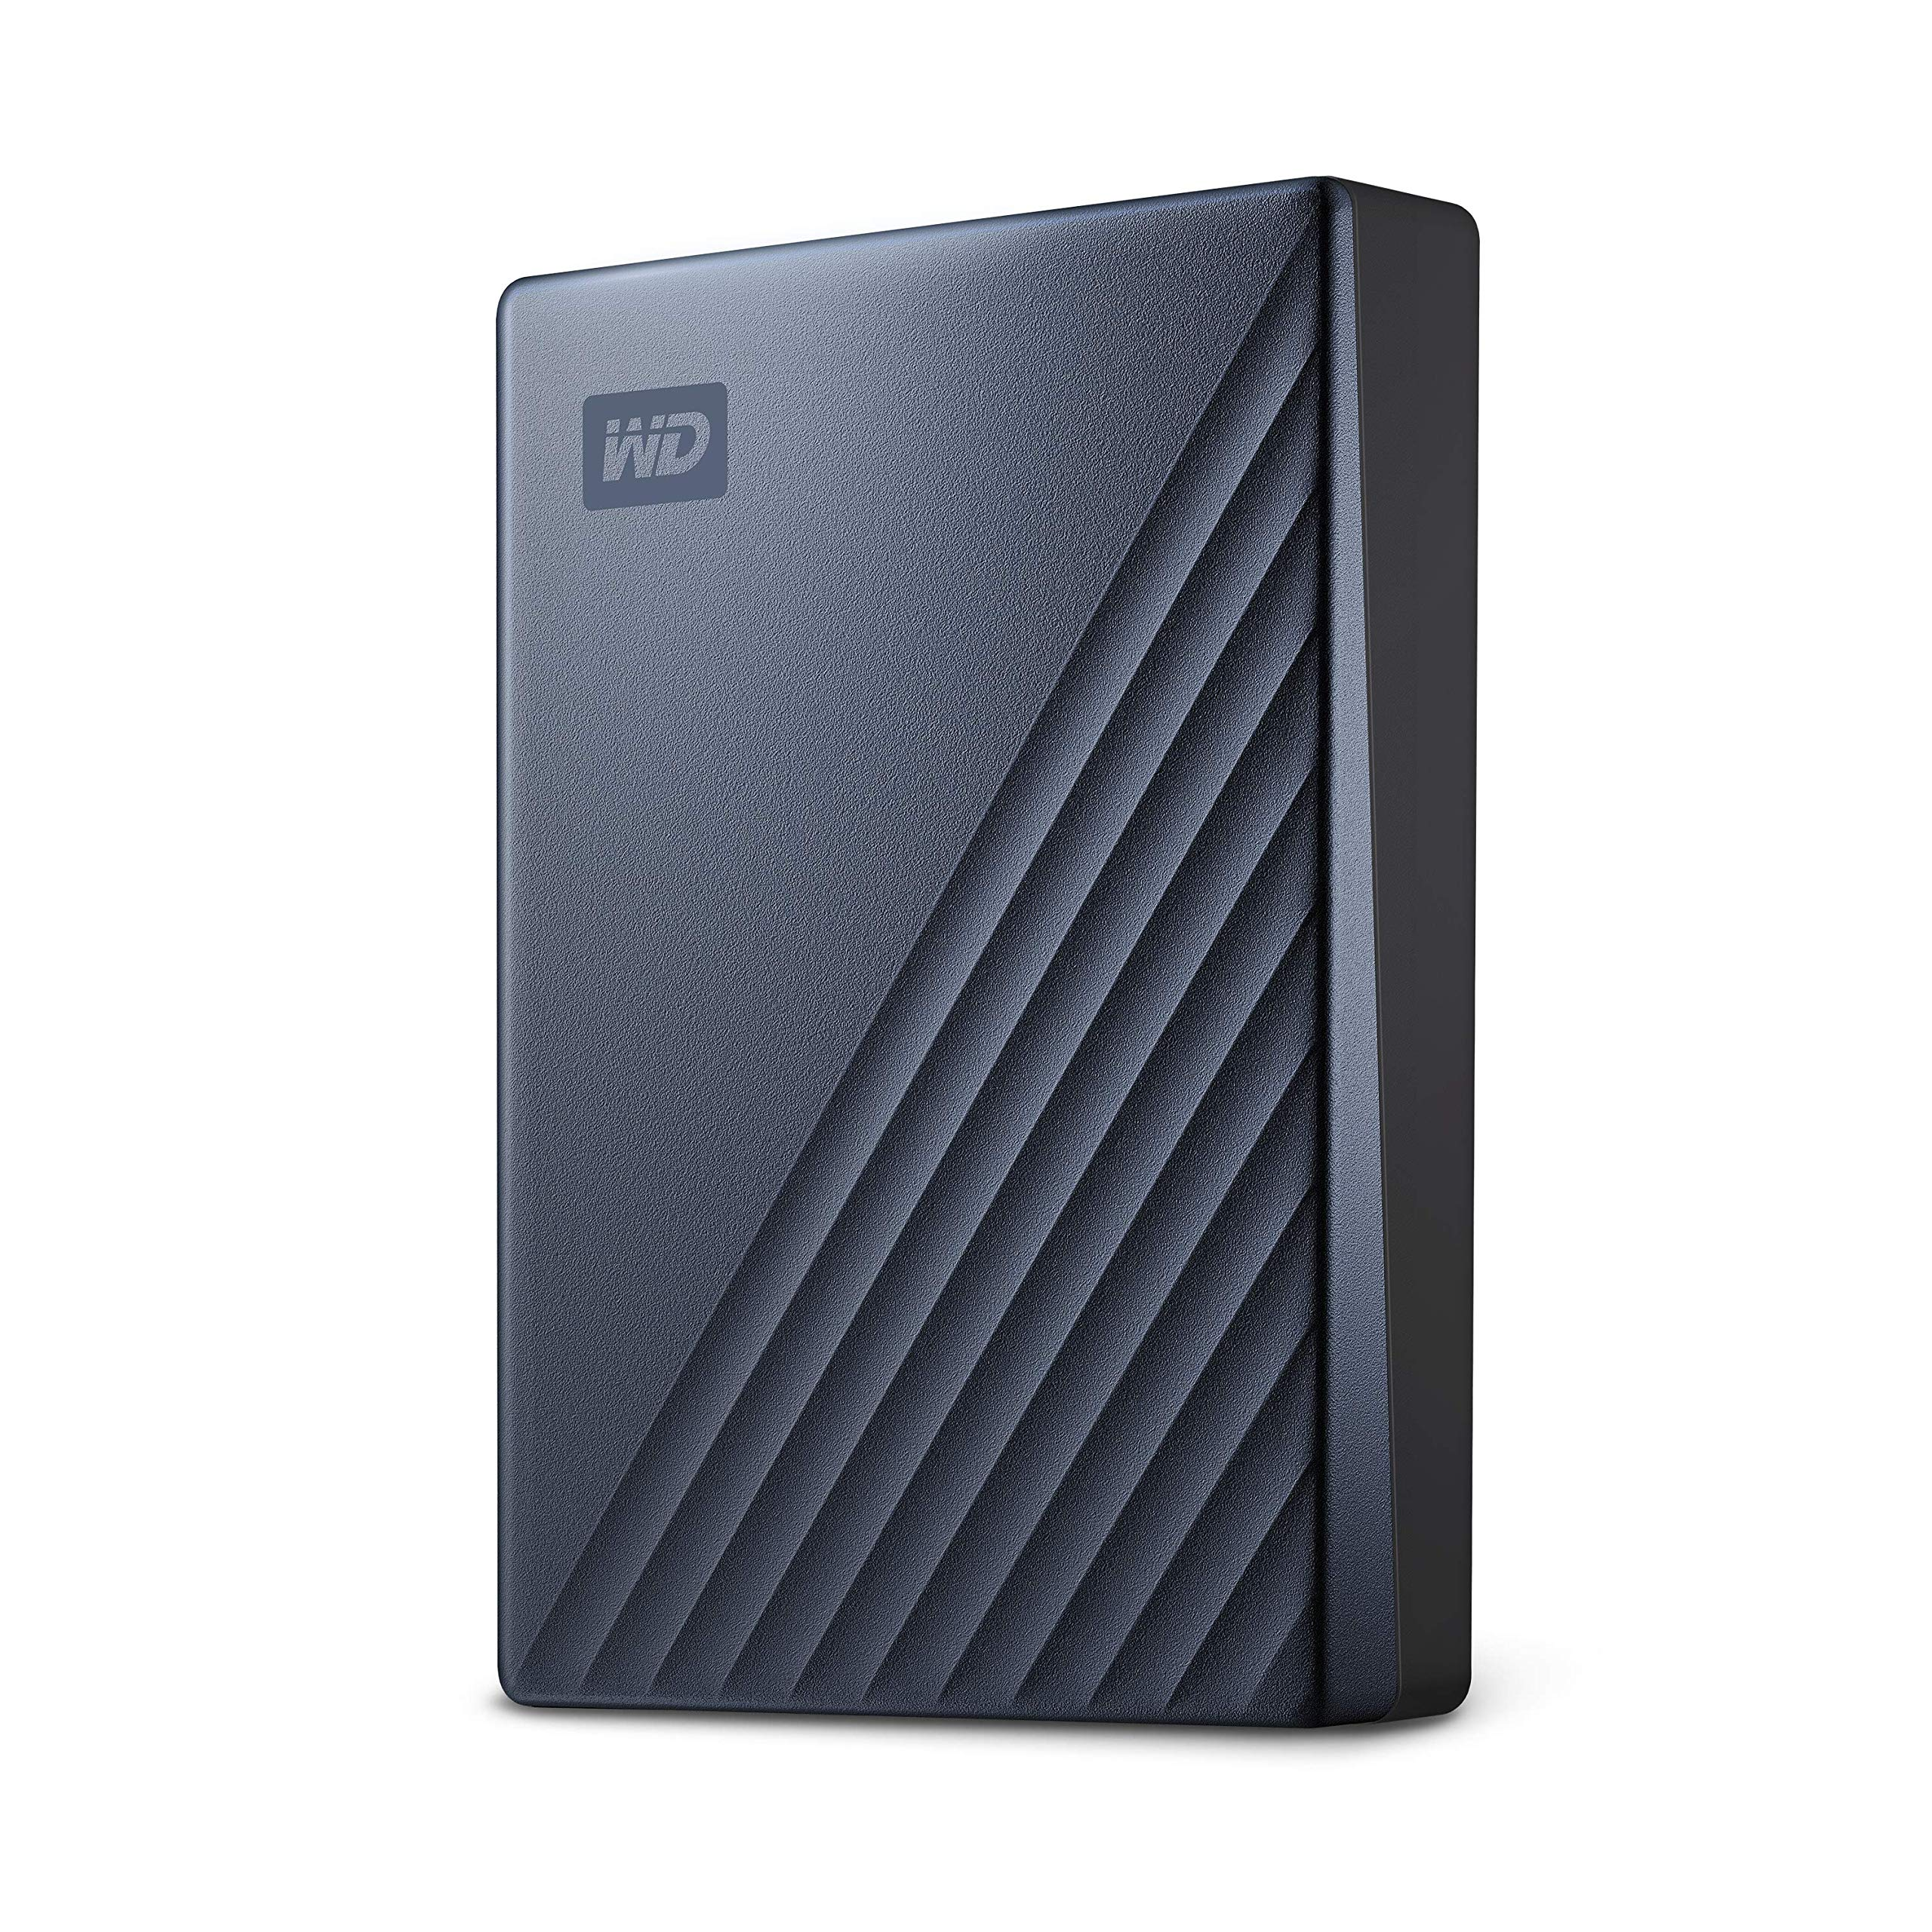 Western Digital 4TB My Passport Ultra Blue Portable External Hard Drive, USB-C - WDBFTM0040BBL-WESN